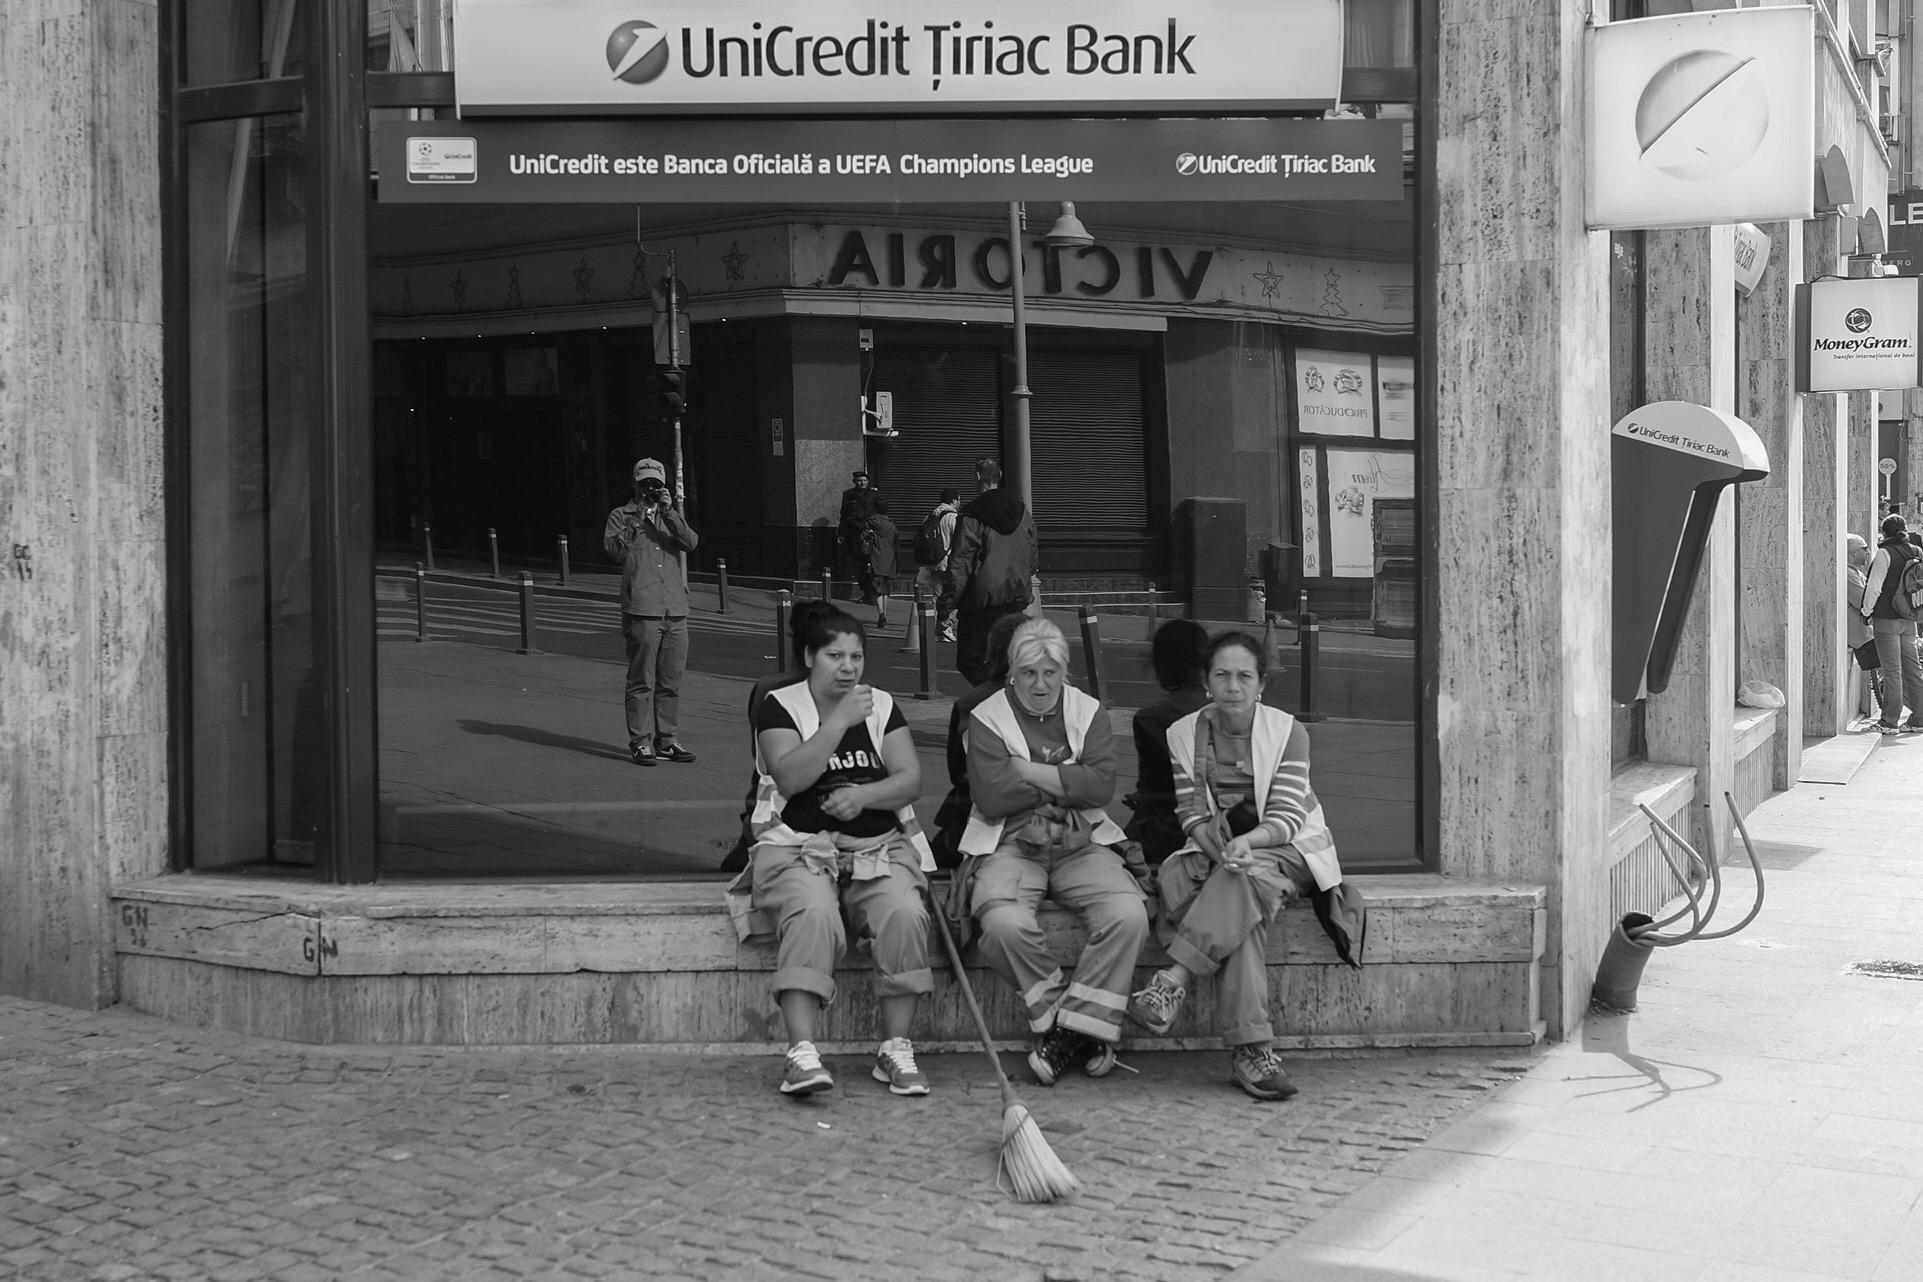 44+ Unicrrdit banca info